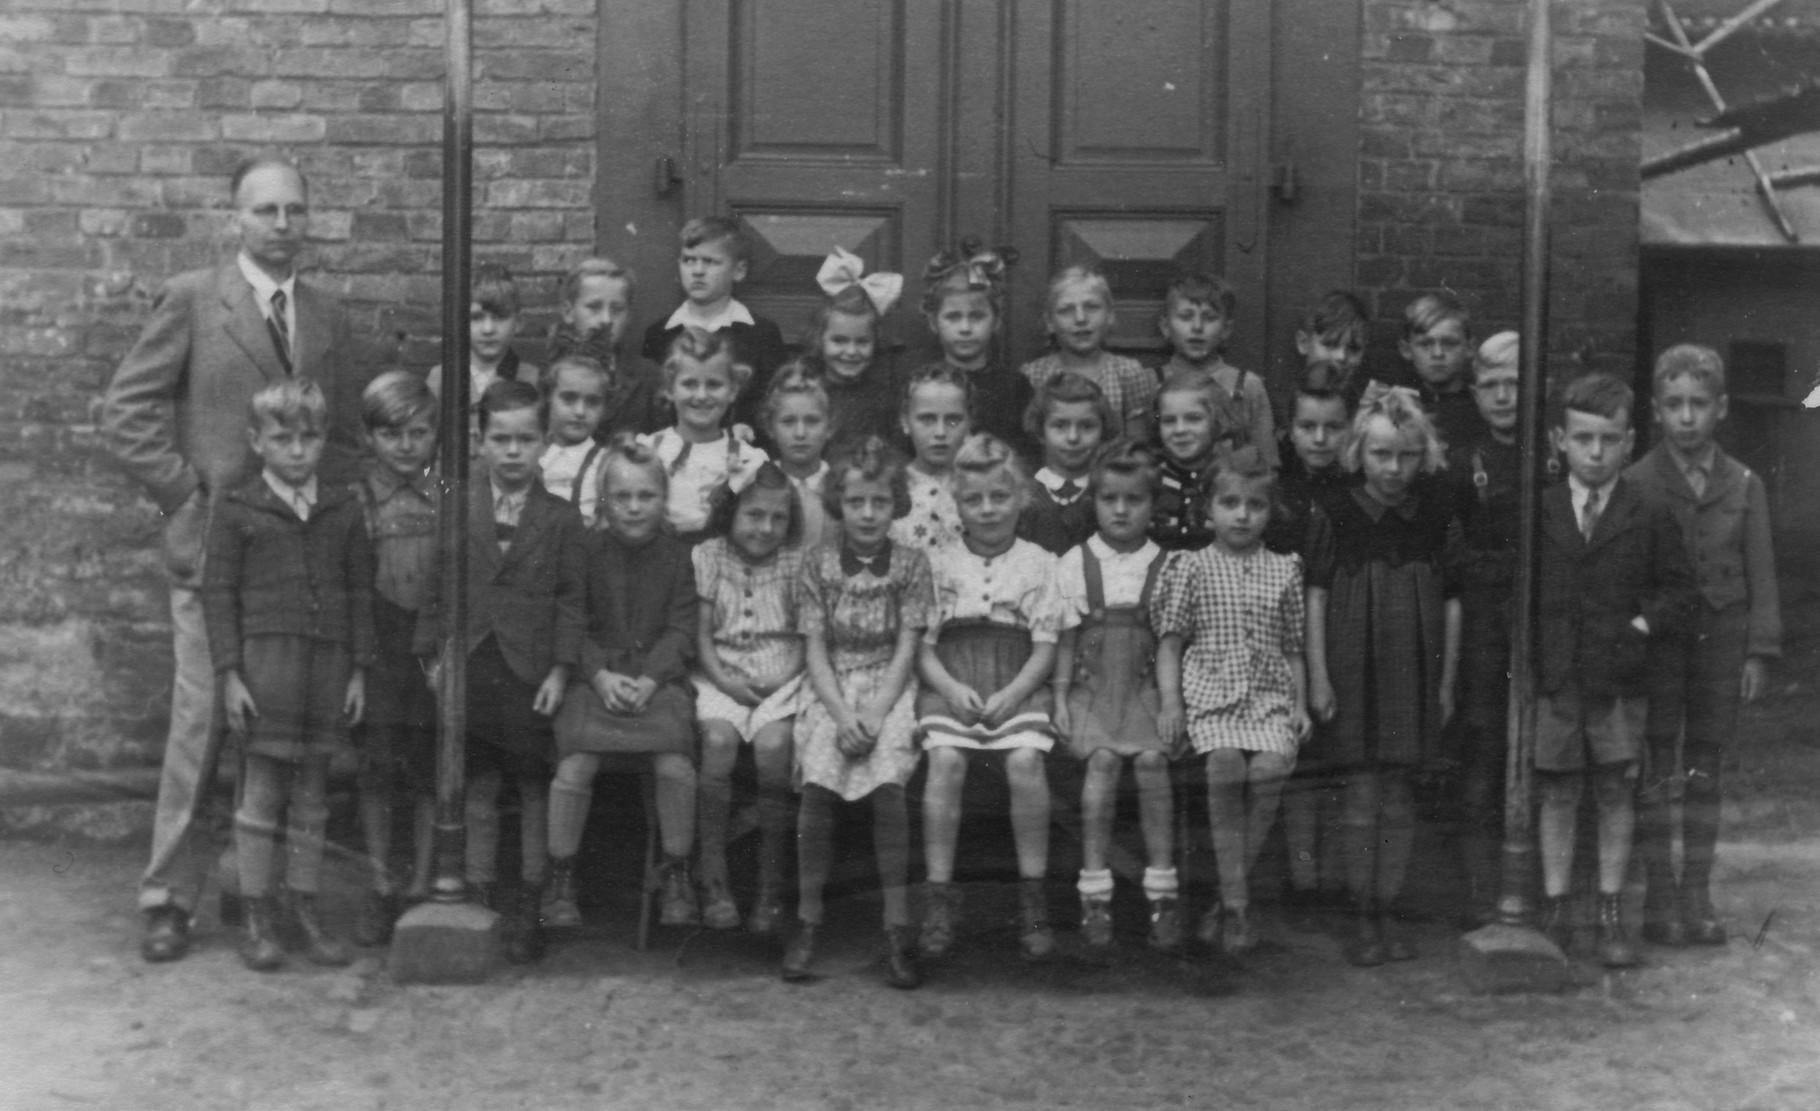 Jahrgang 1938, Bild: Weimar,Else geb. Bruder